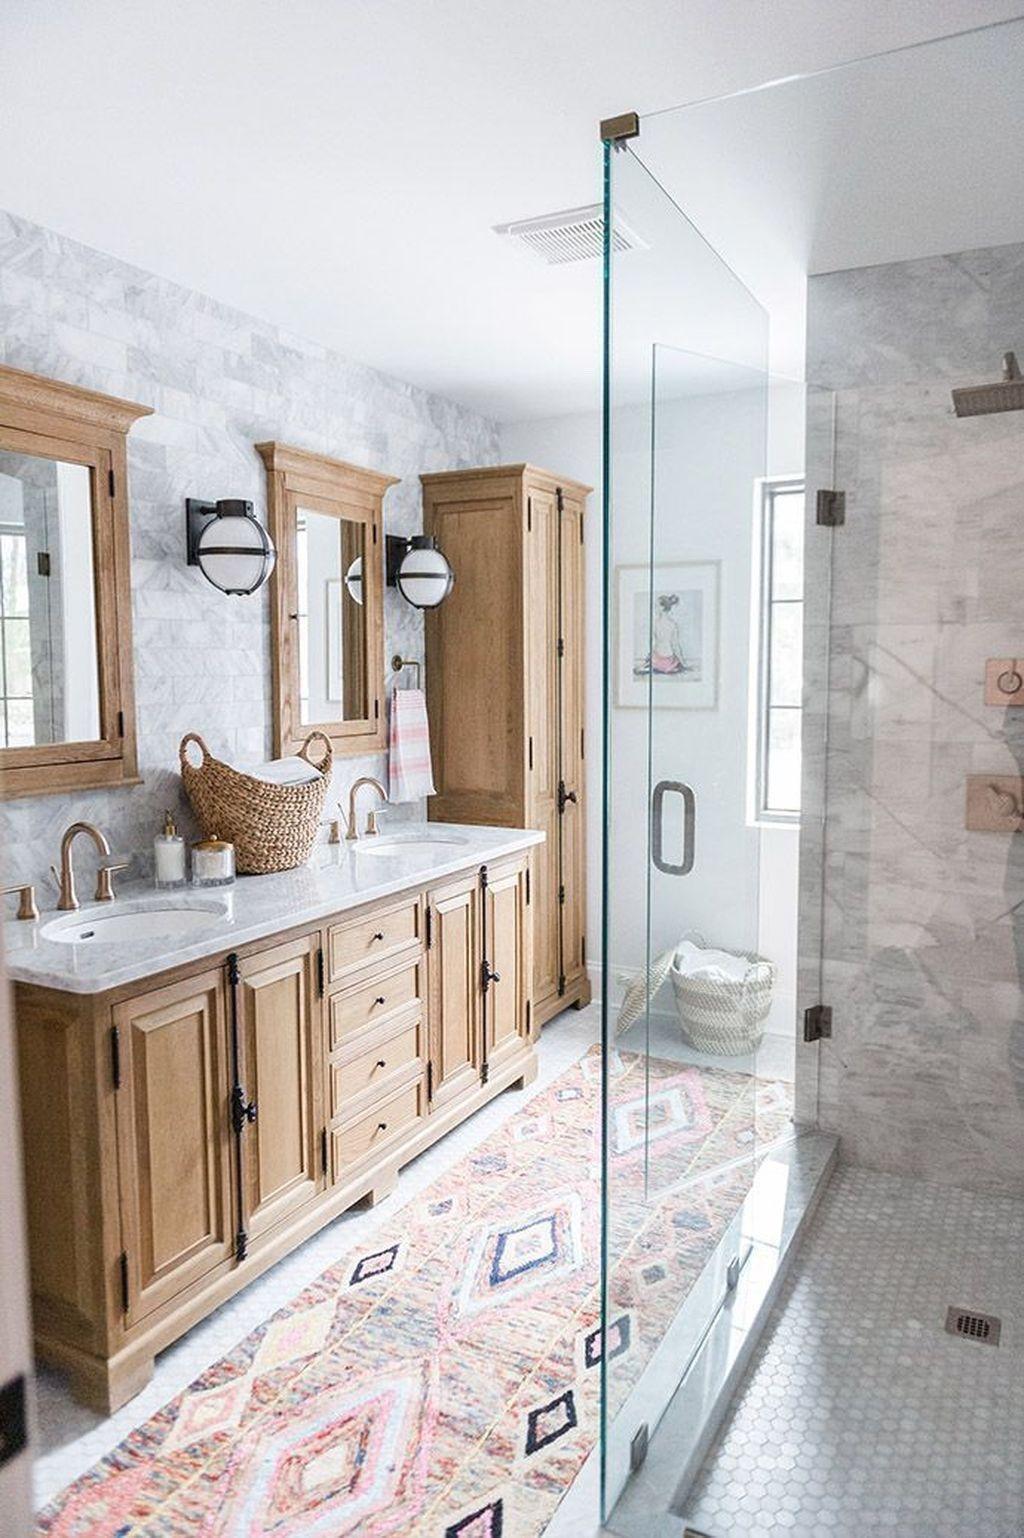 Bathroom Ideas Bathroom Renovations On A Budget | Bathroom ...